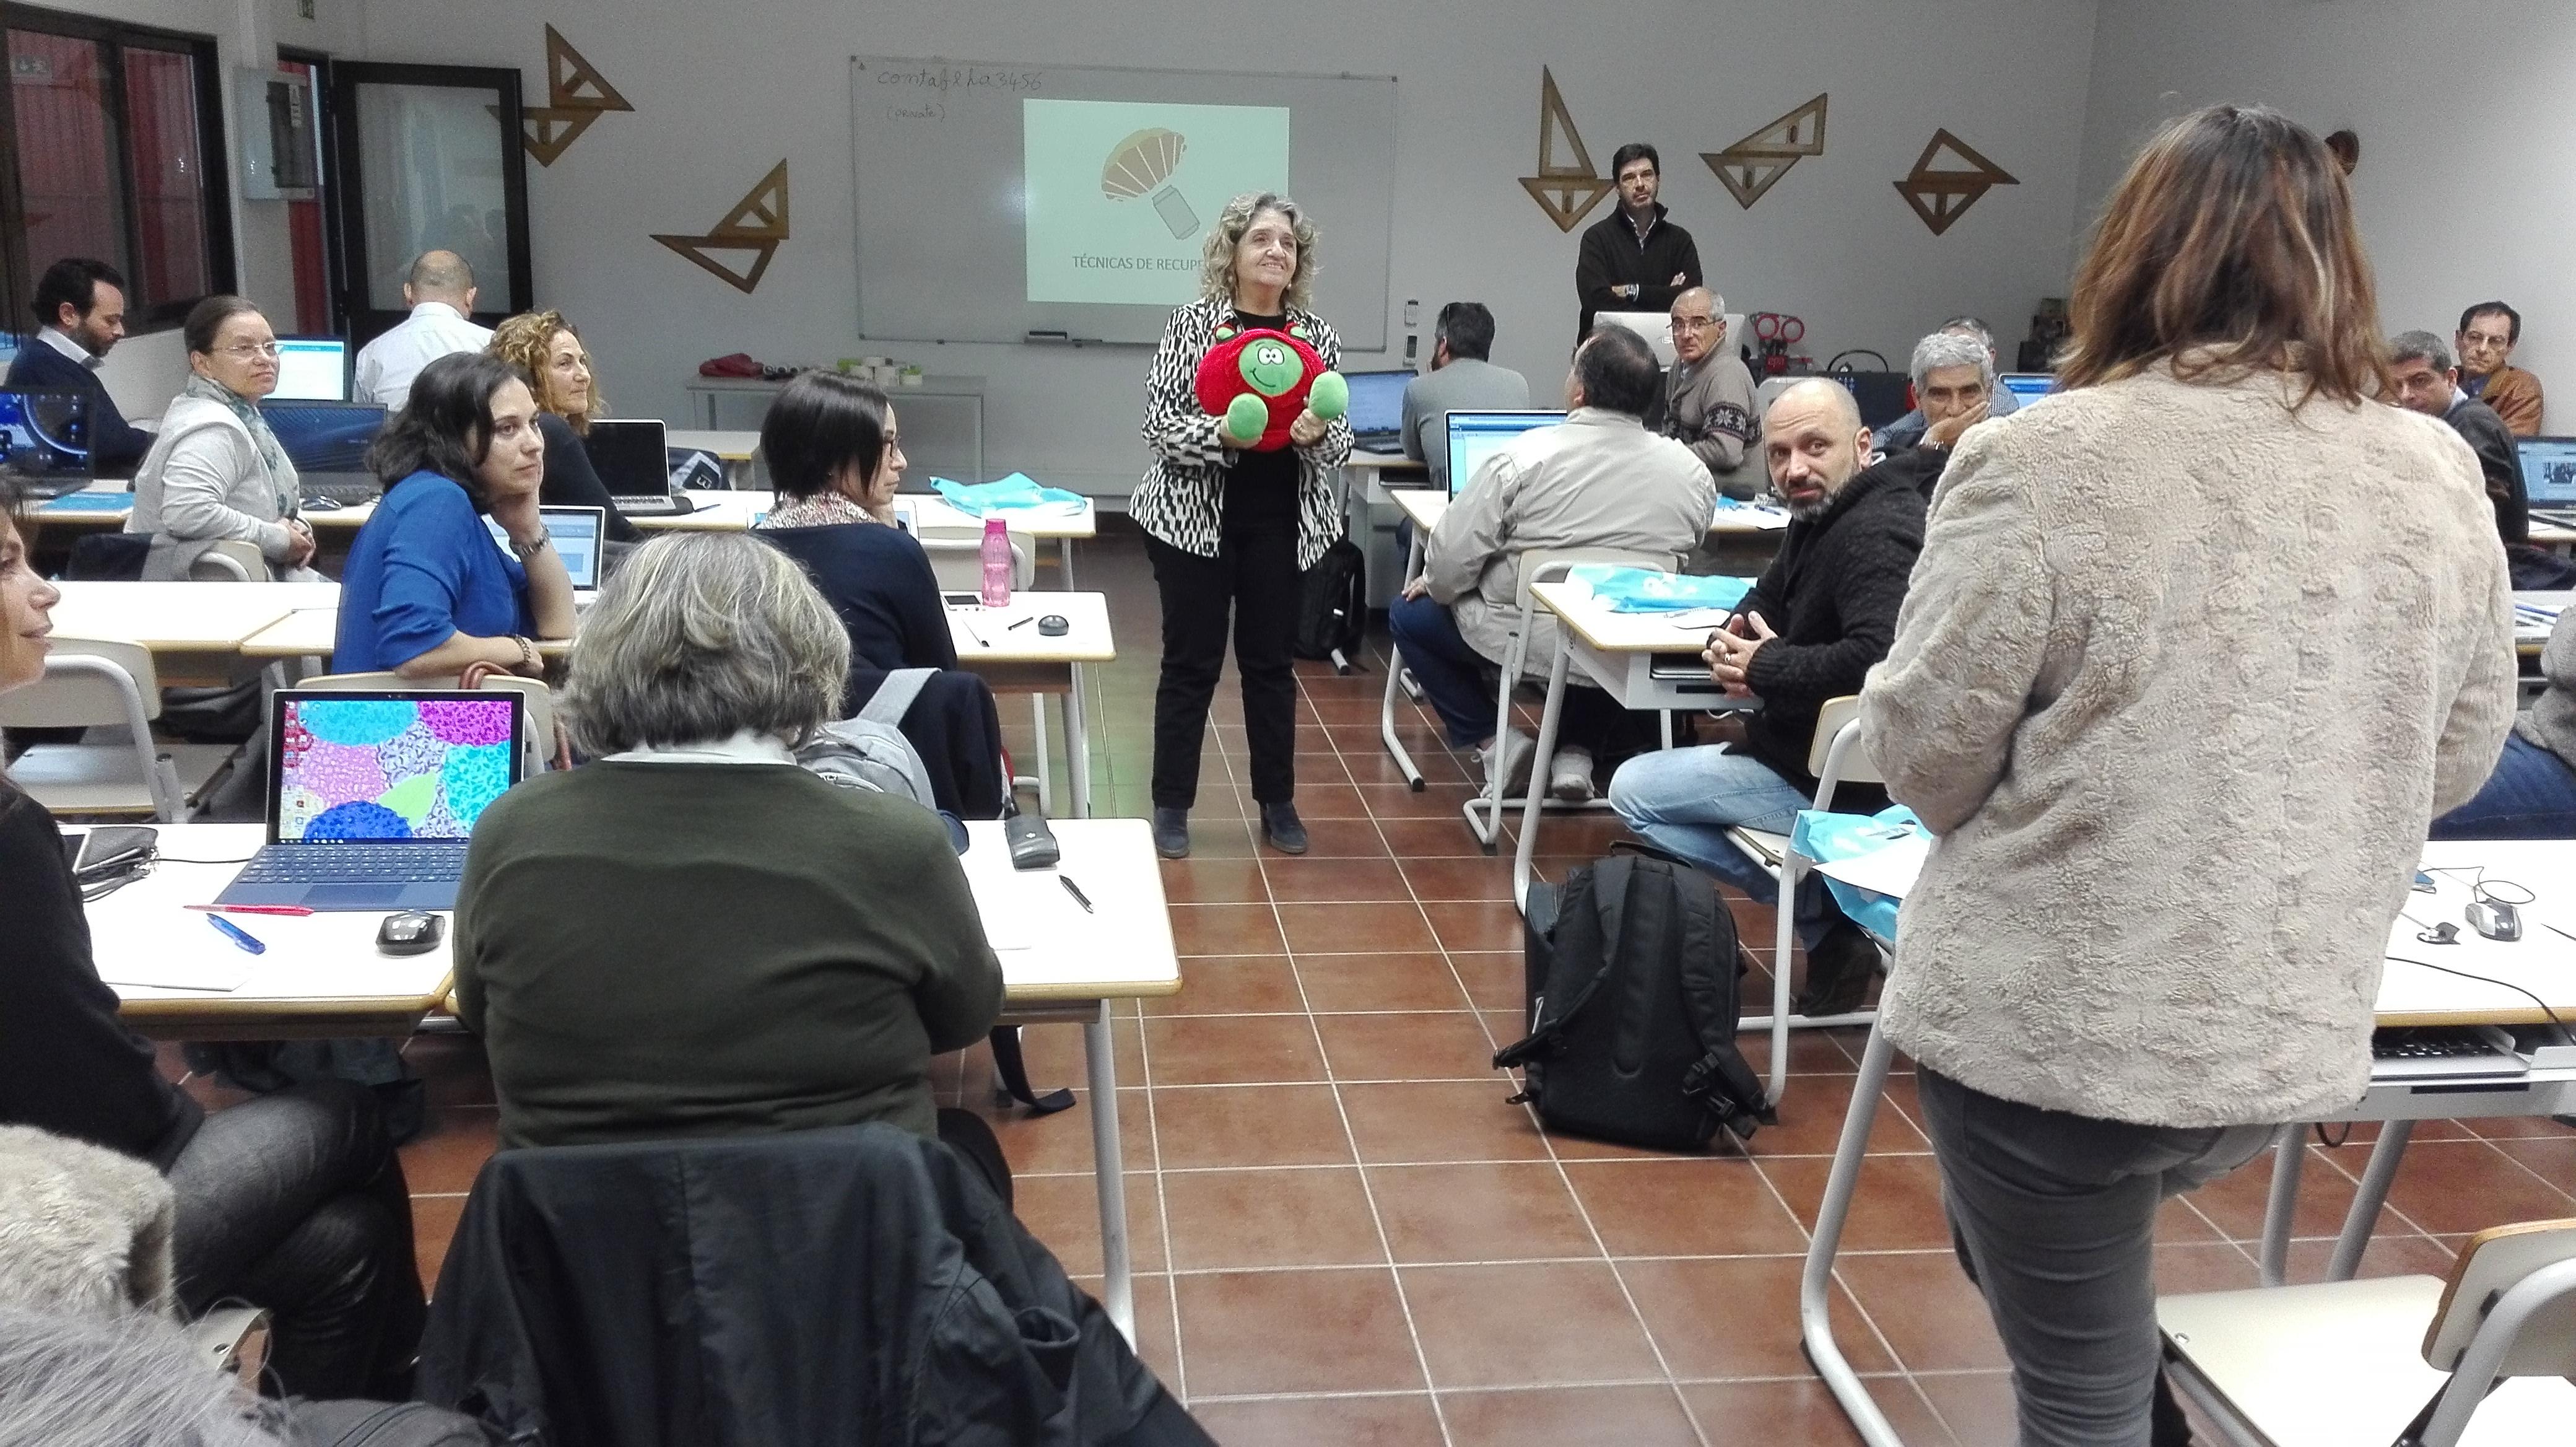 Adelina Machado e Paxi dão as boas-vindas aos professores participantes.